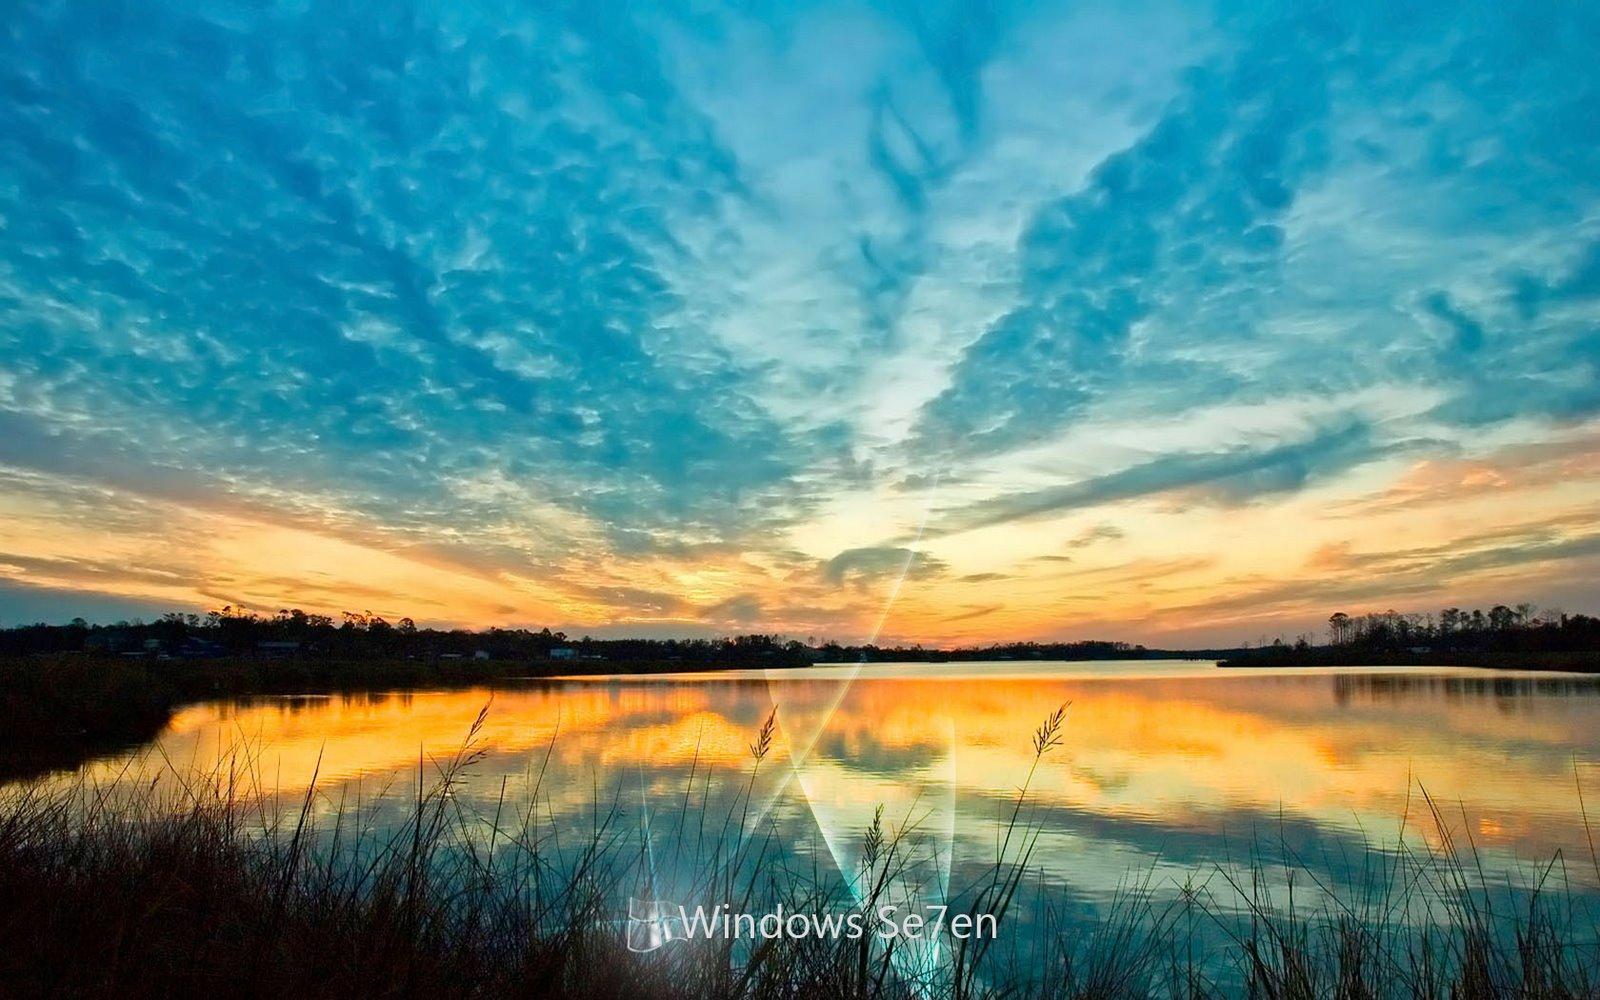 http://2.bp.blogspot.com/-mPqYpsHSuvI/TuUHPTj61kI/AAAAAAAABzg/MaMGy6k8_x8/s1600/windows_7_sunset_wallpaper.jpg